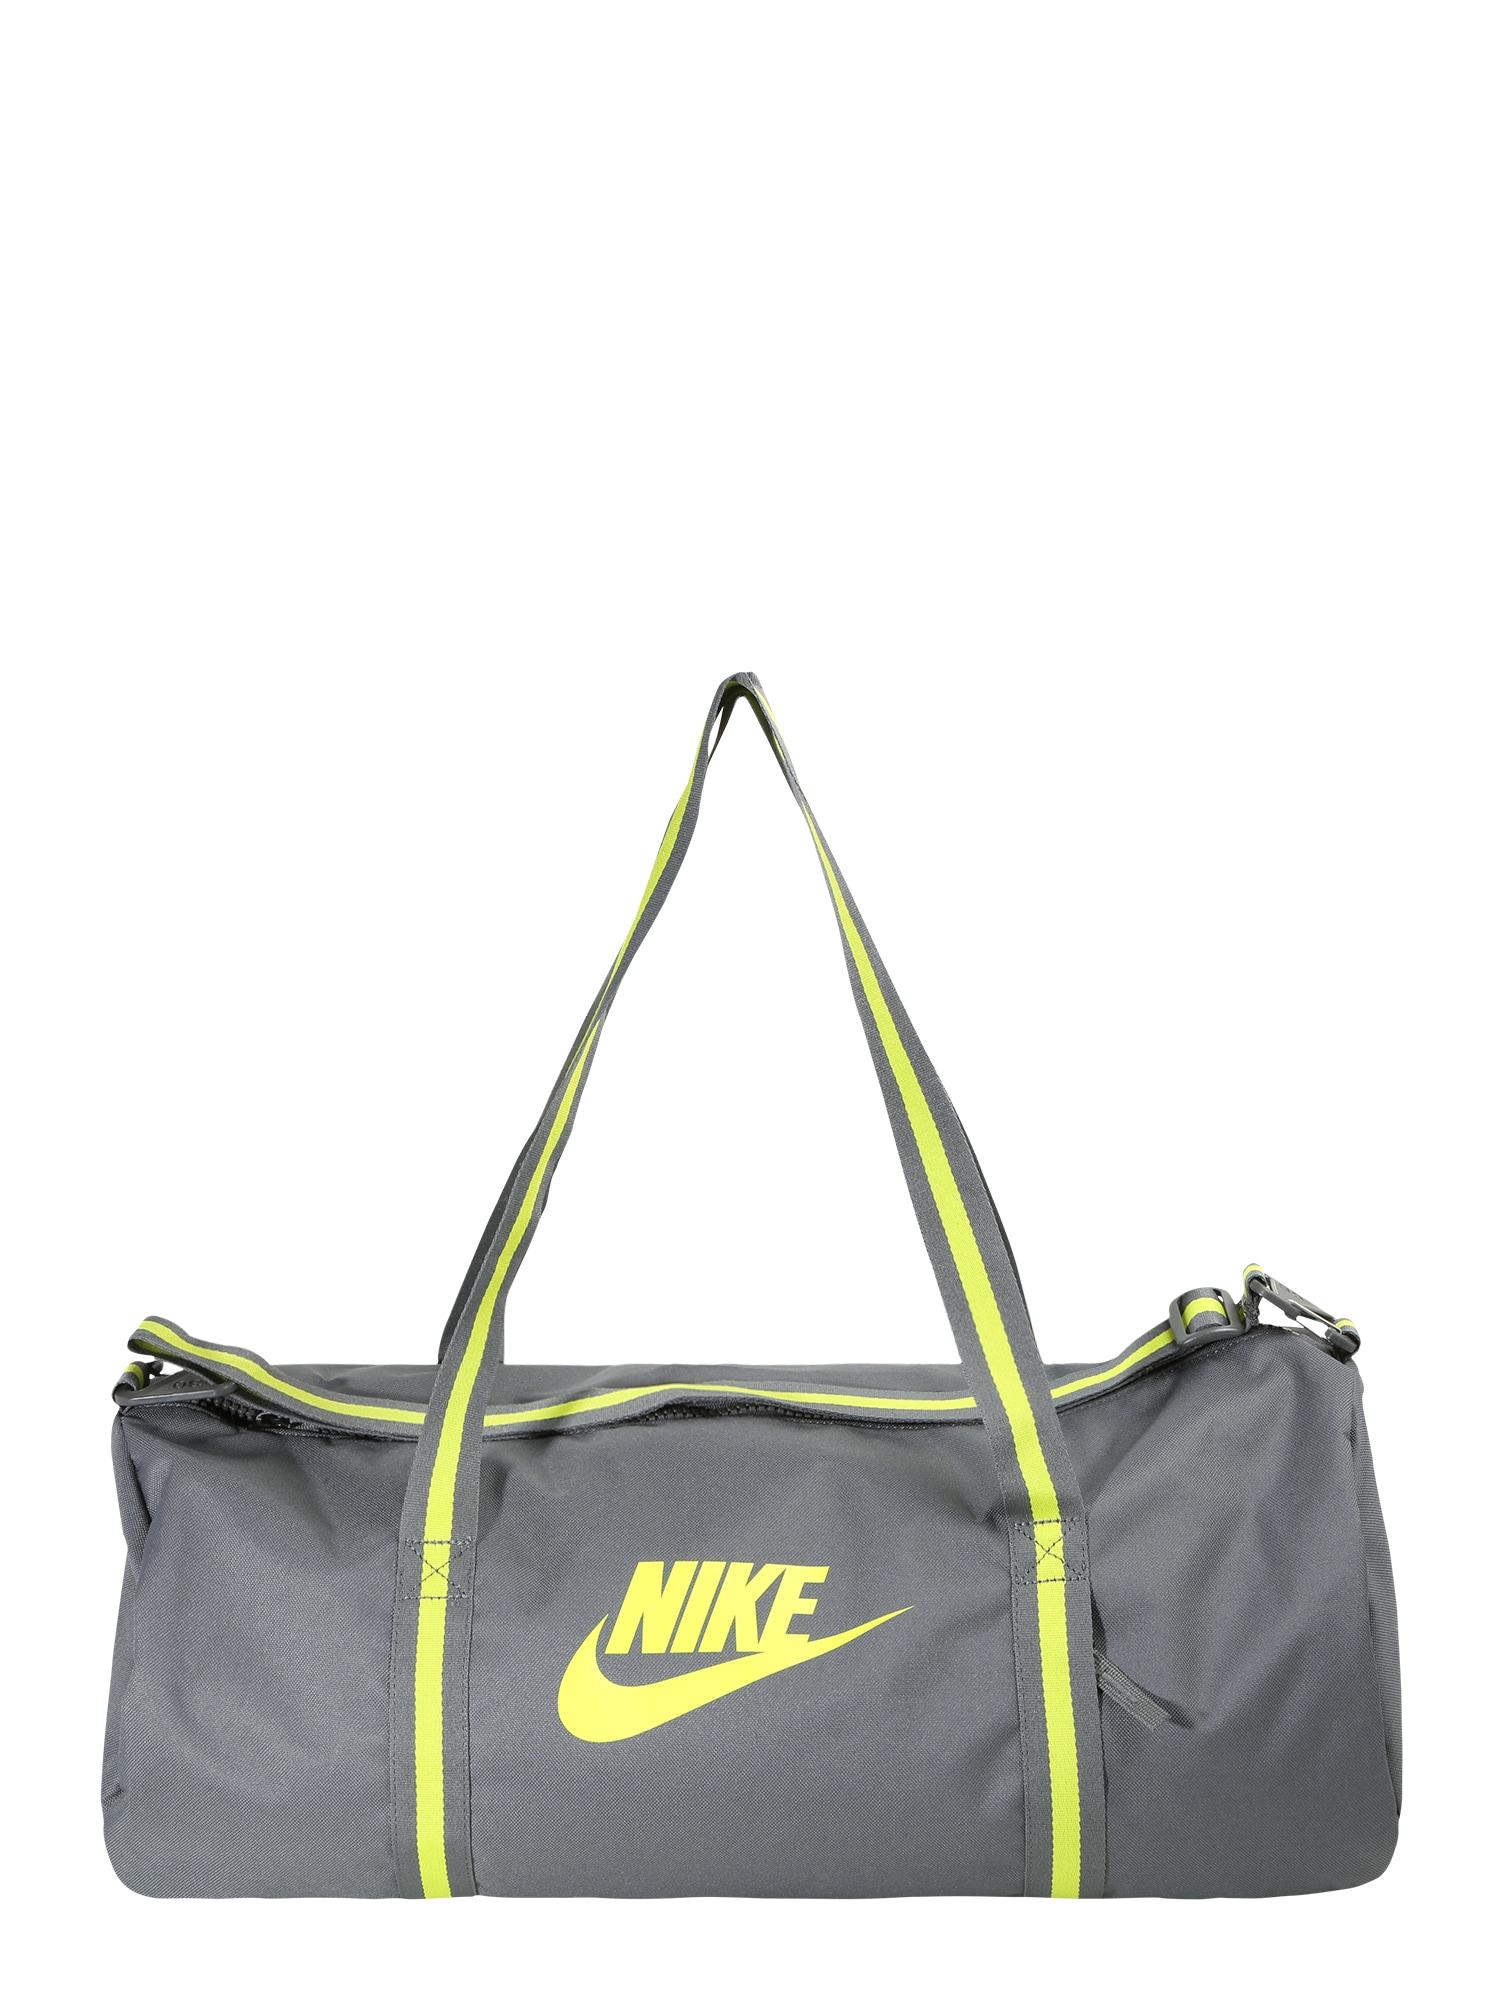 Nike Sportswear Kelioninis krepšys